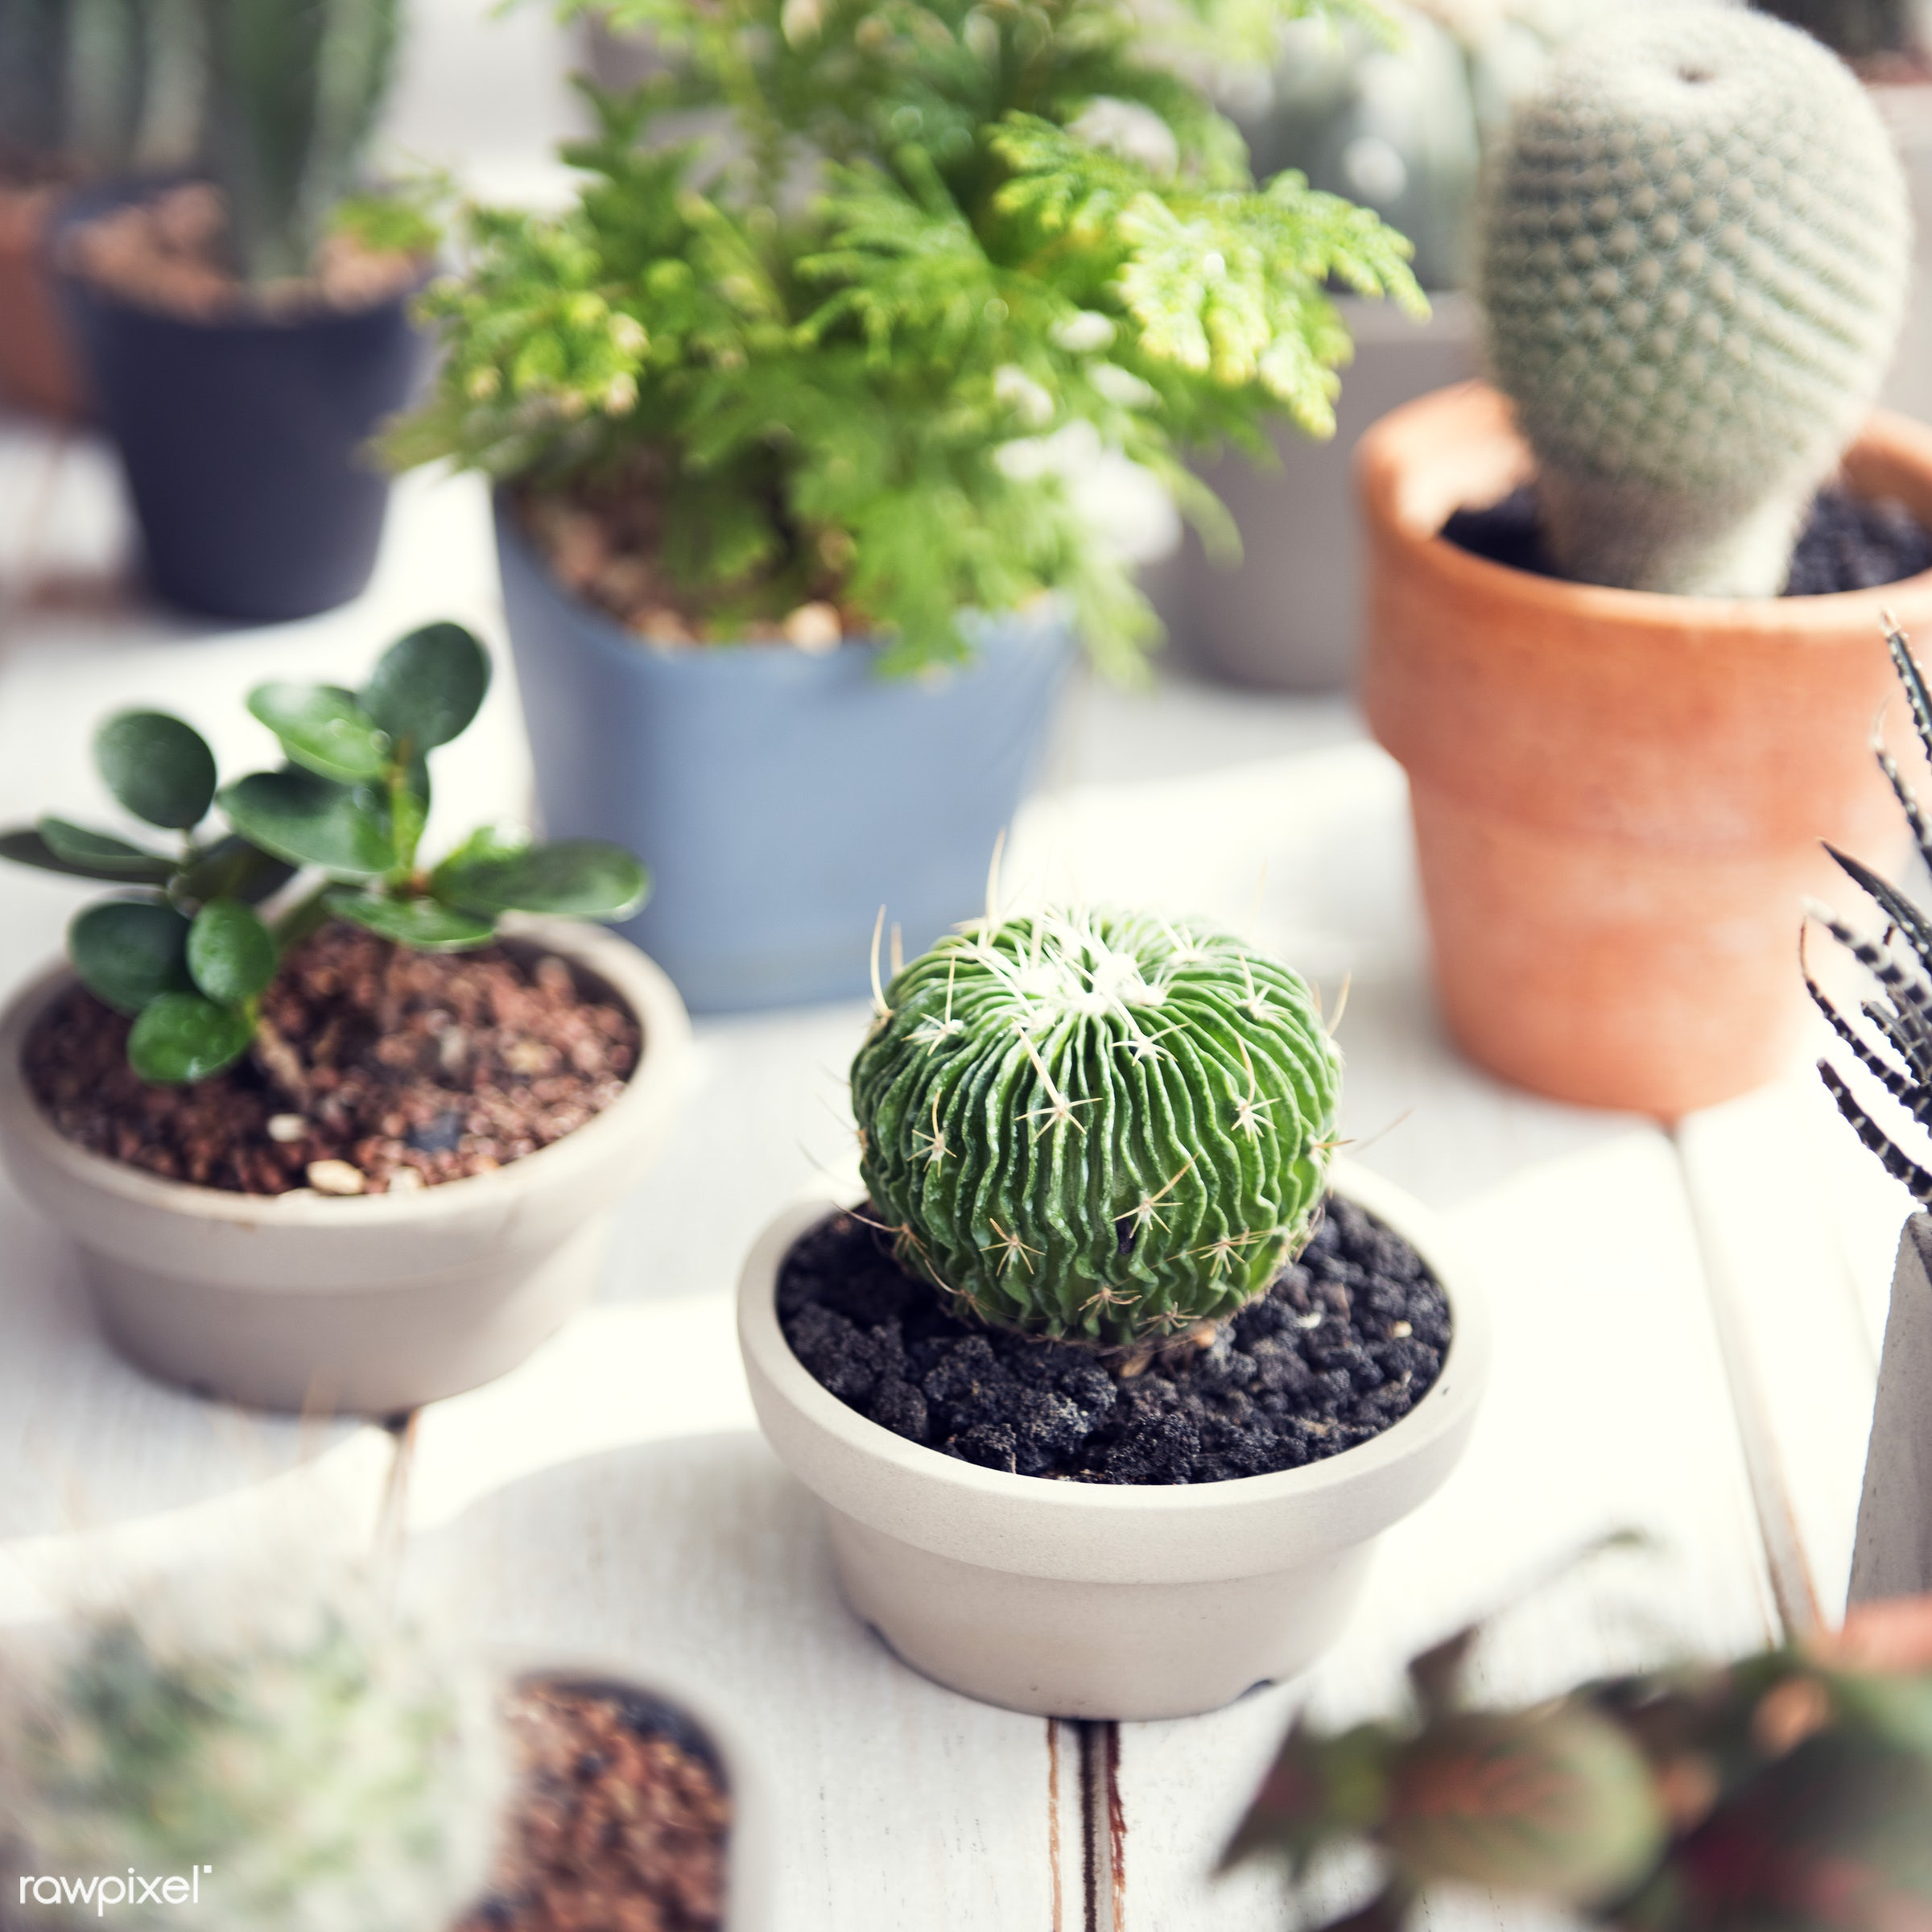 green, botany, cactus, closeup, houseplants, nobody, plants, pots, real, wooden table